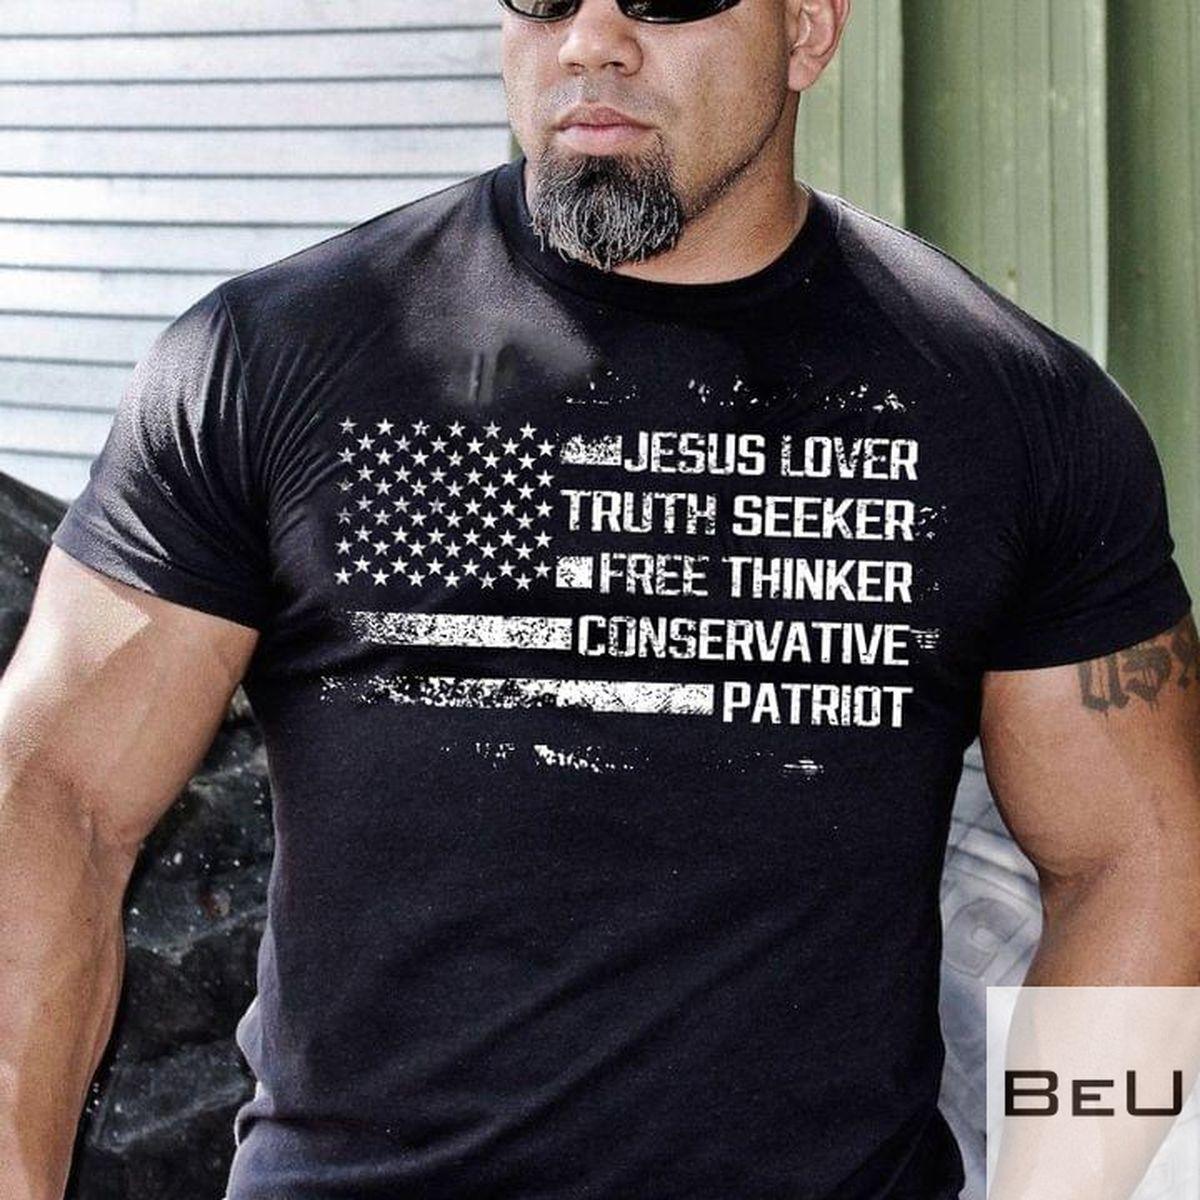 Jesus Lover Truth Seeker Free Thinker Conservative Patriot Shirt, hoodie, tank top